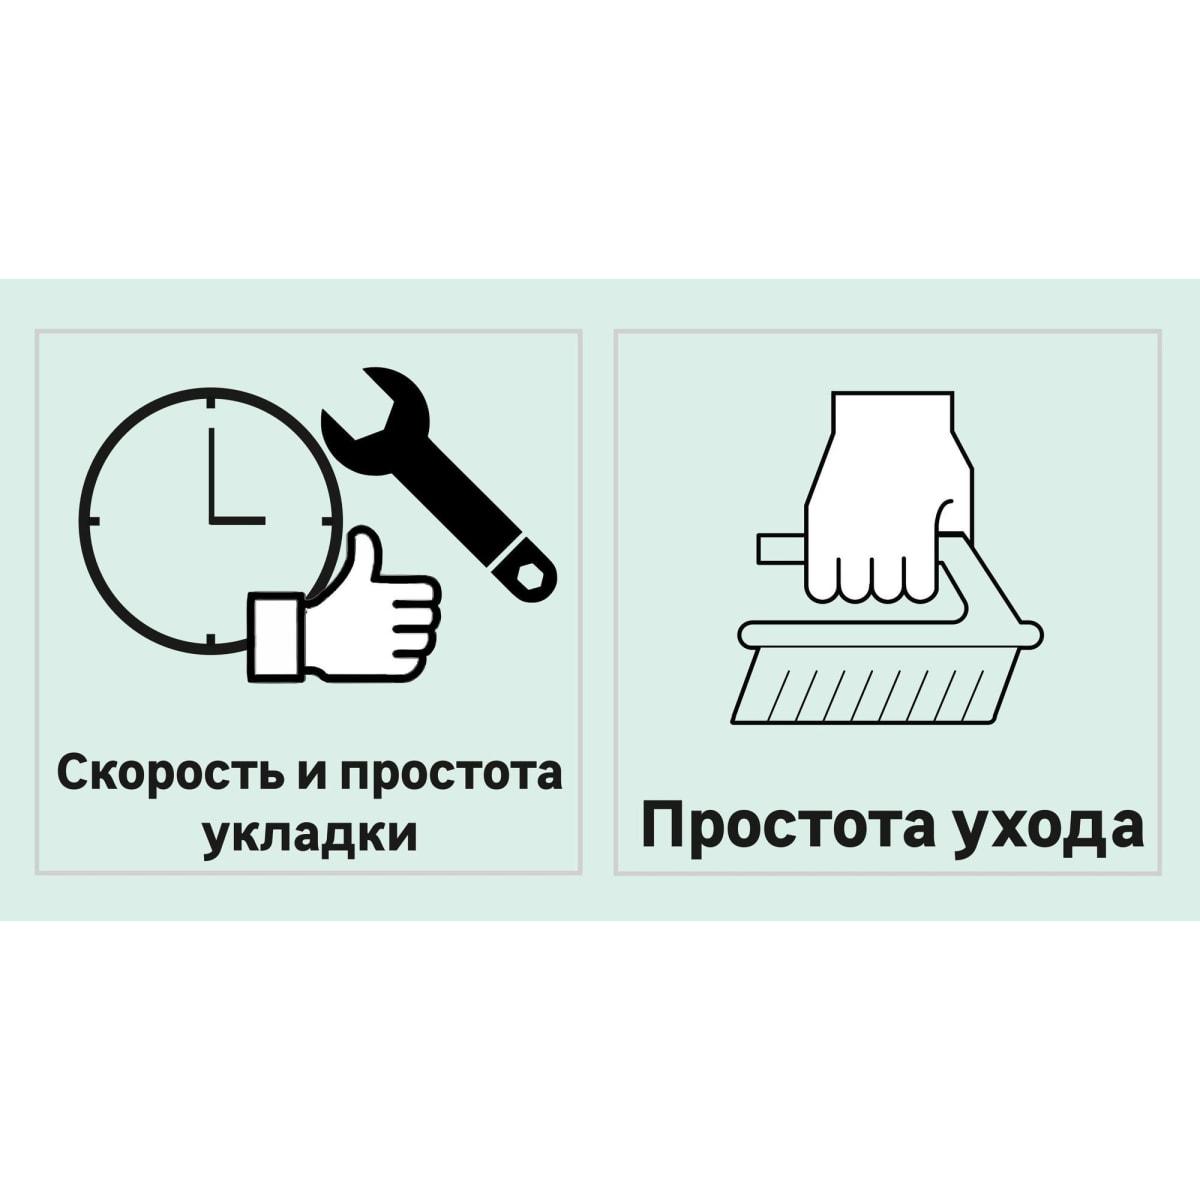 Банк хоум кредит октябрьский башкортостан адрес